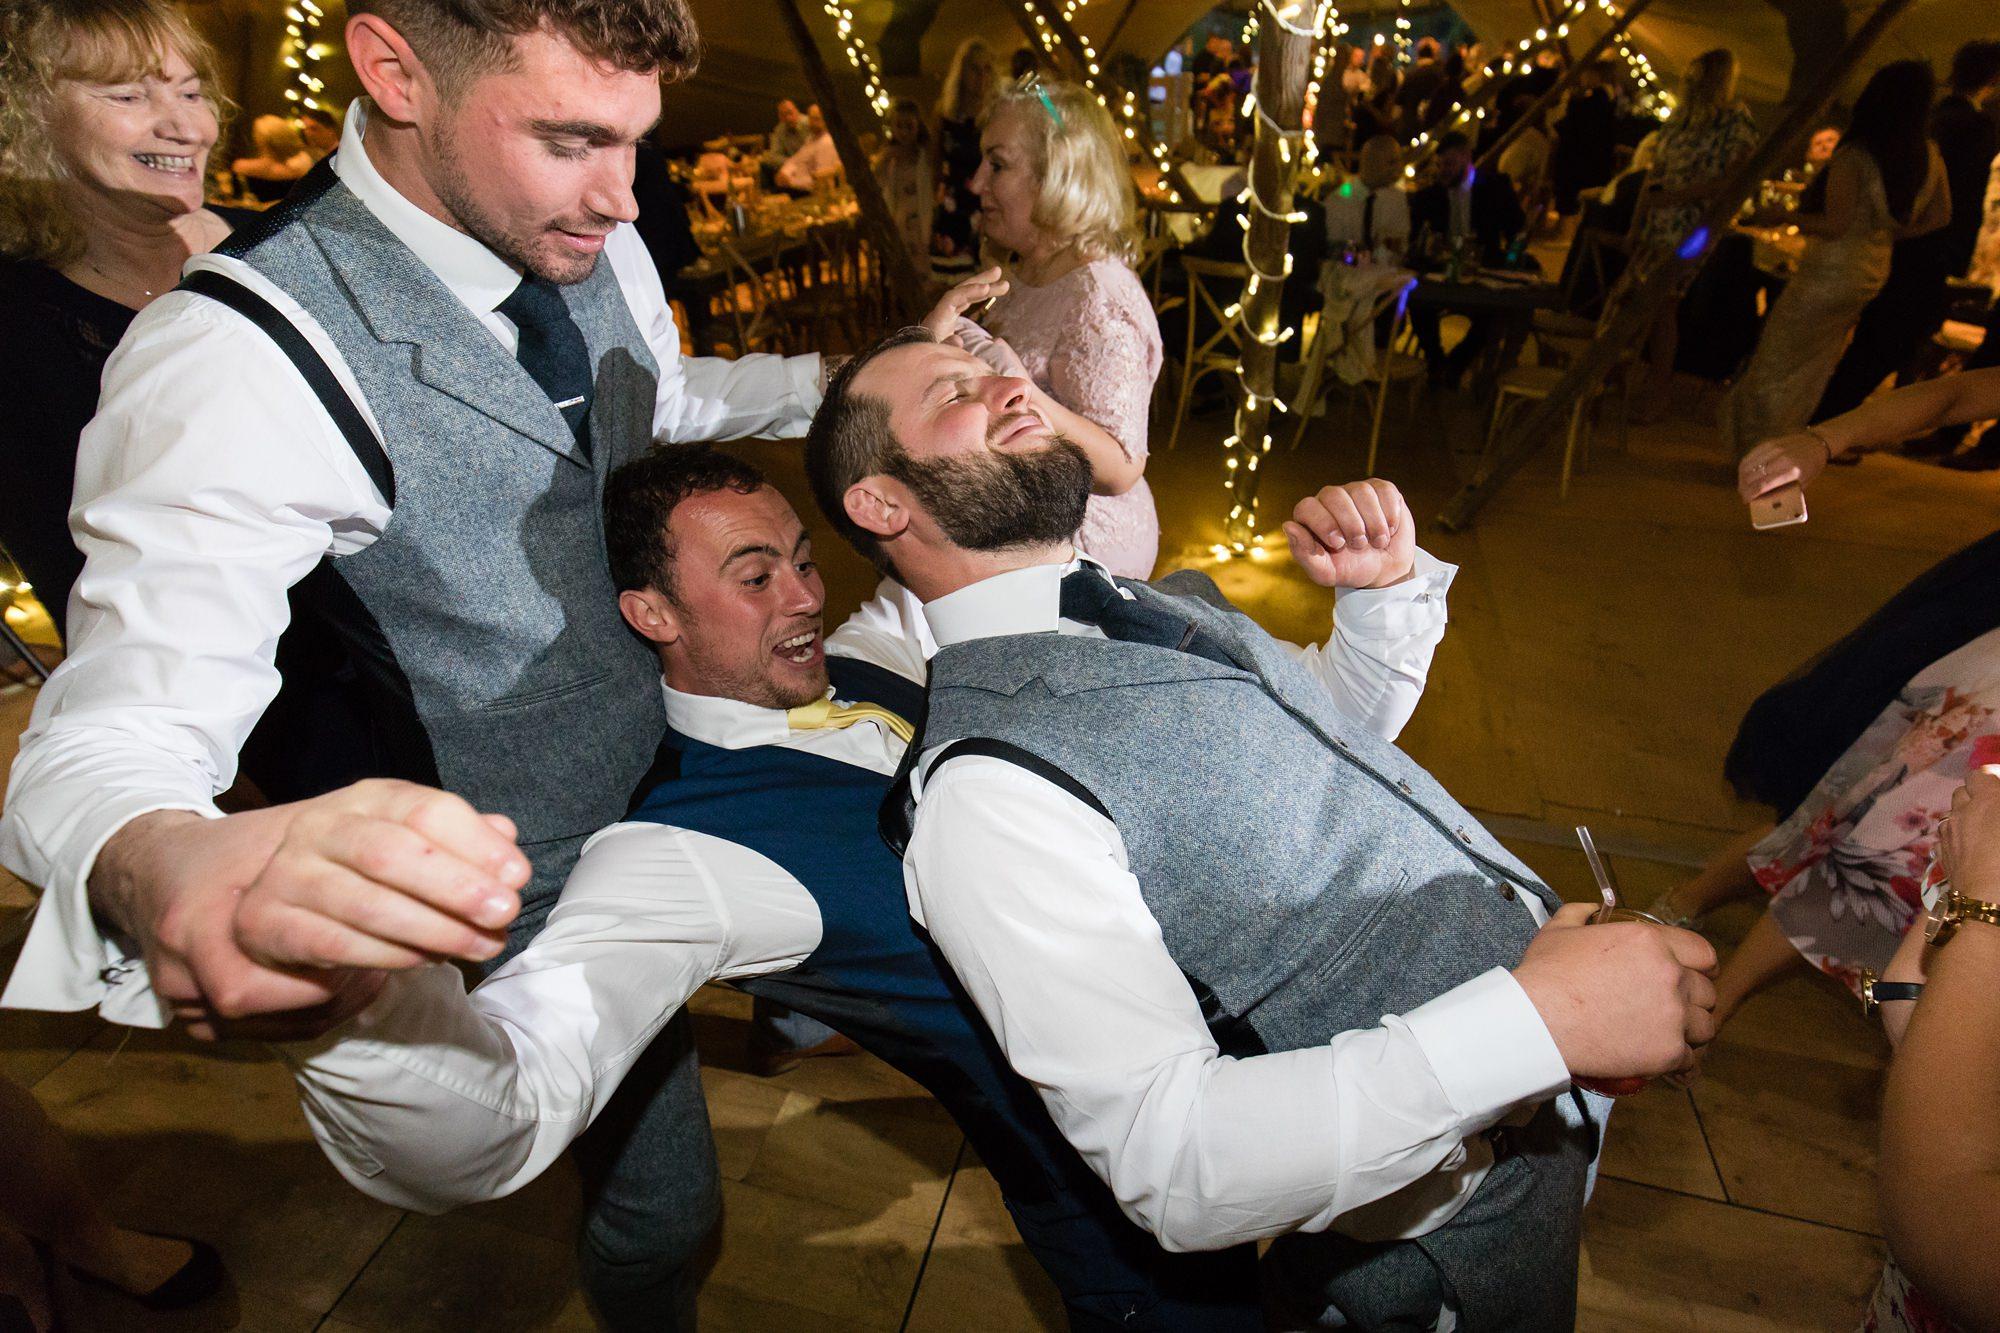 Villa farm wedding photography guests dancing